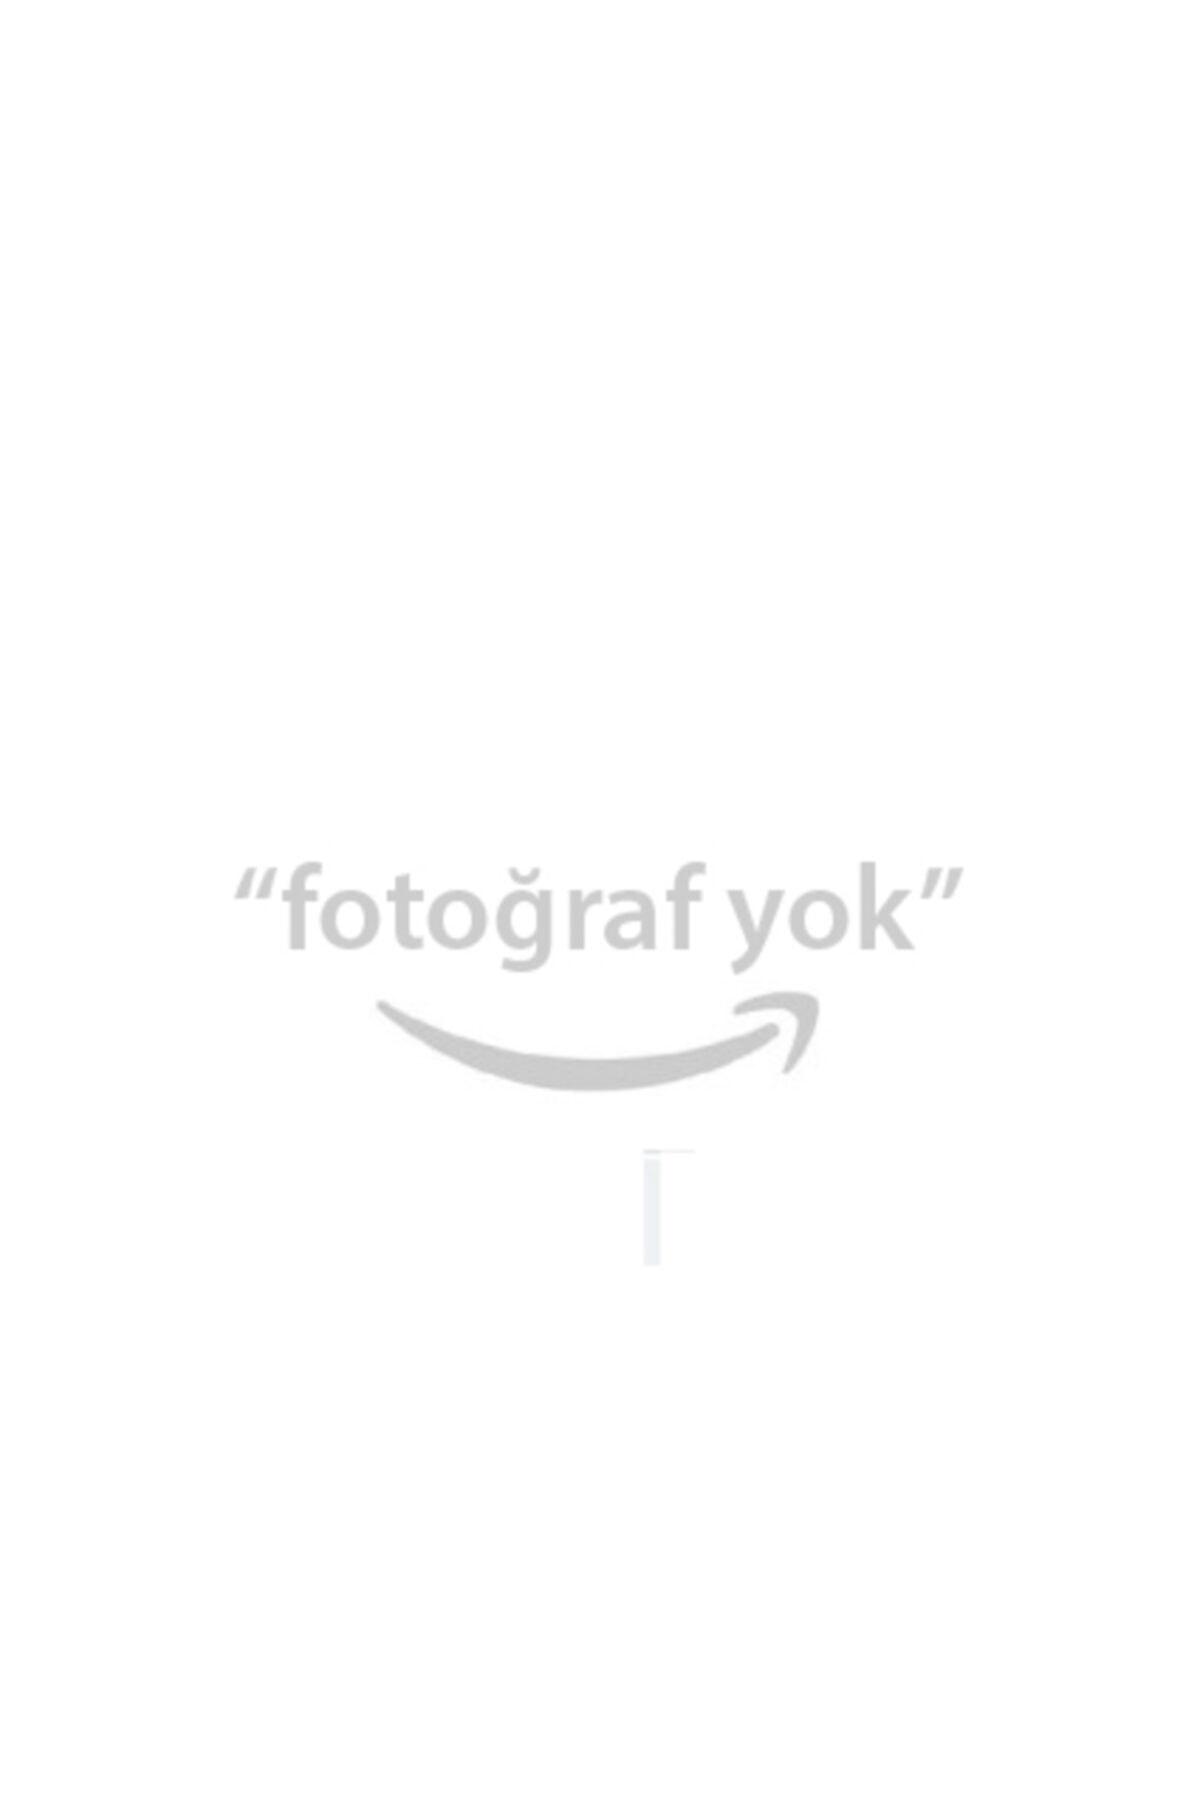 Ssangyong Ssang Yong Korando Sport (2011+) Borulu Plakalık - 2806plk3b8 1